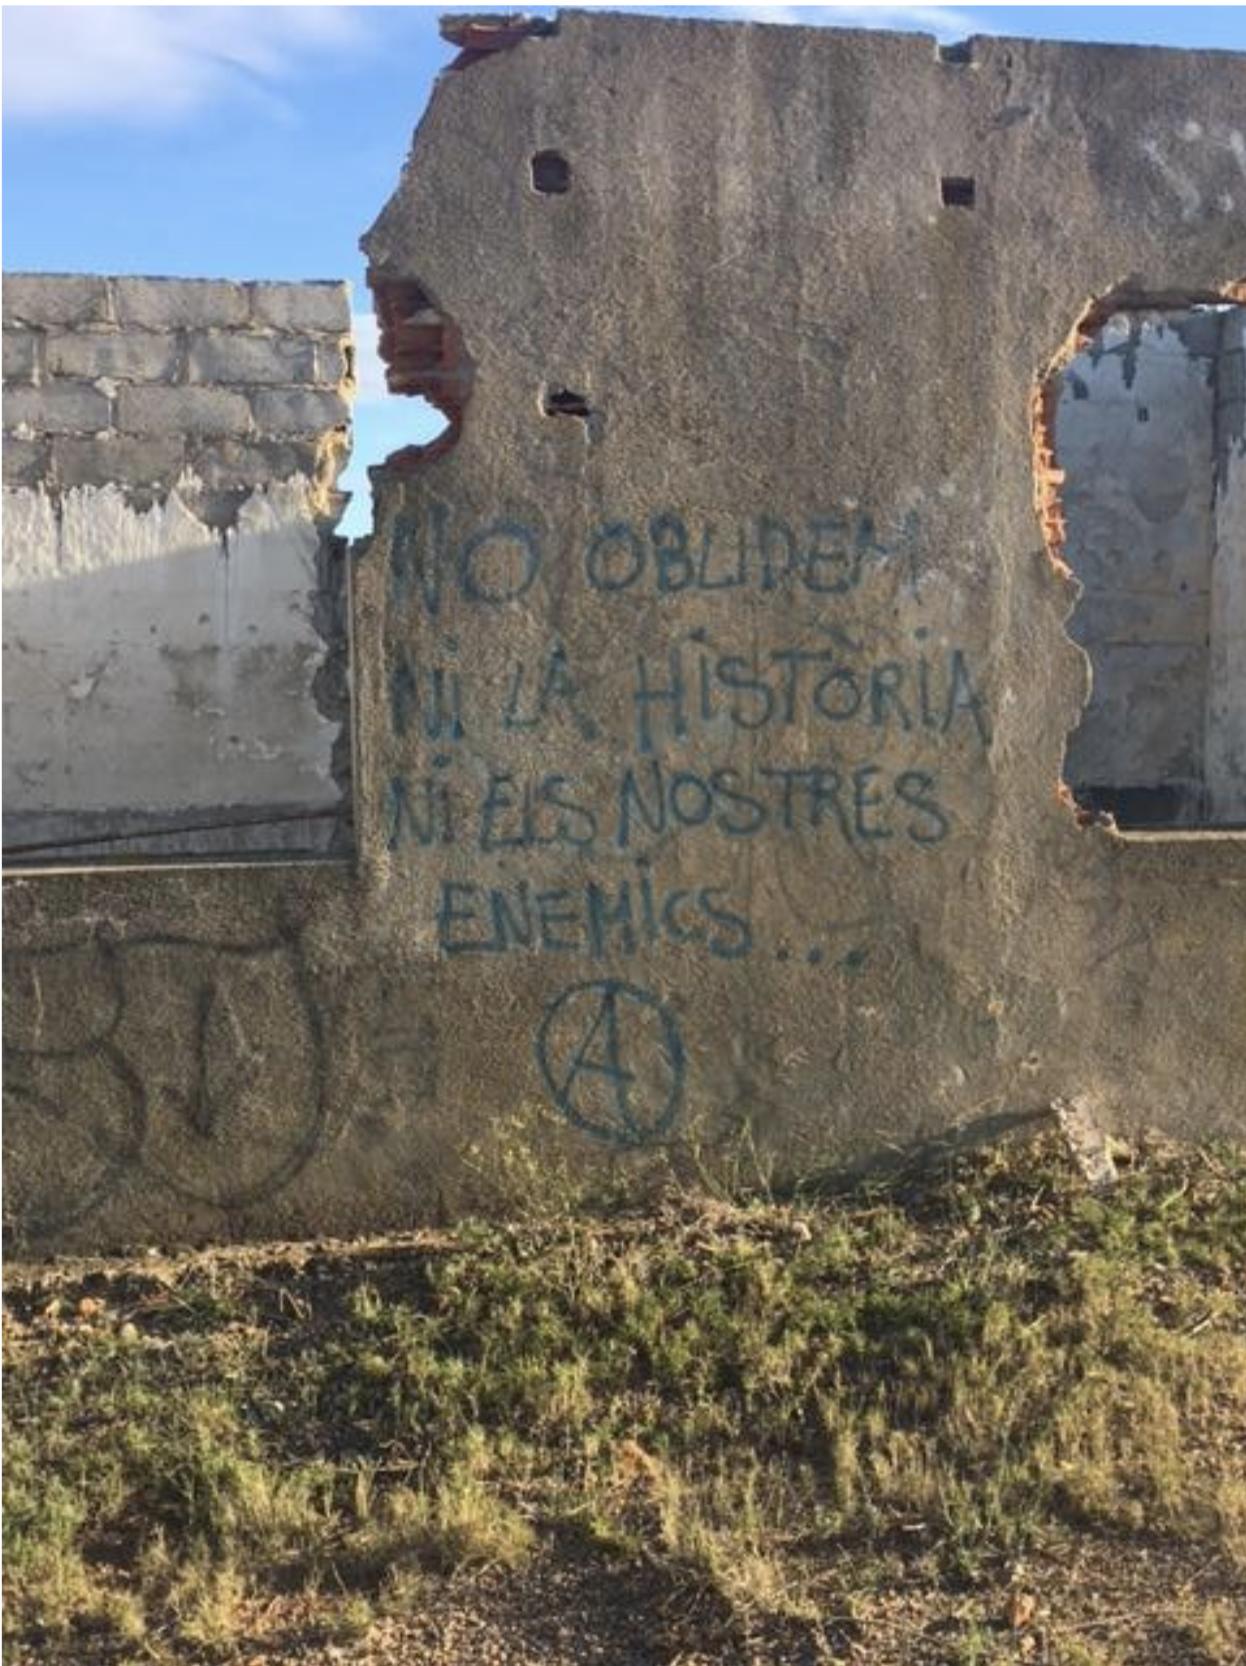 'No oblidiem ni la història ni les nostres enemics…'  'Forget neither the history or our enemies'